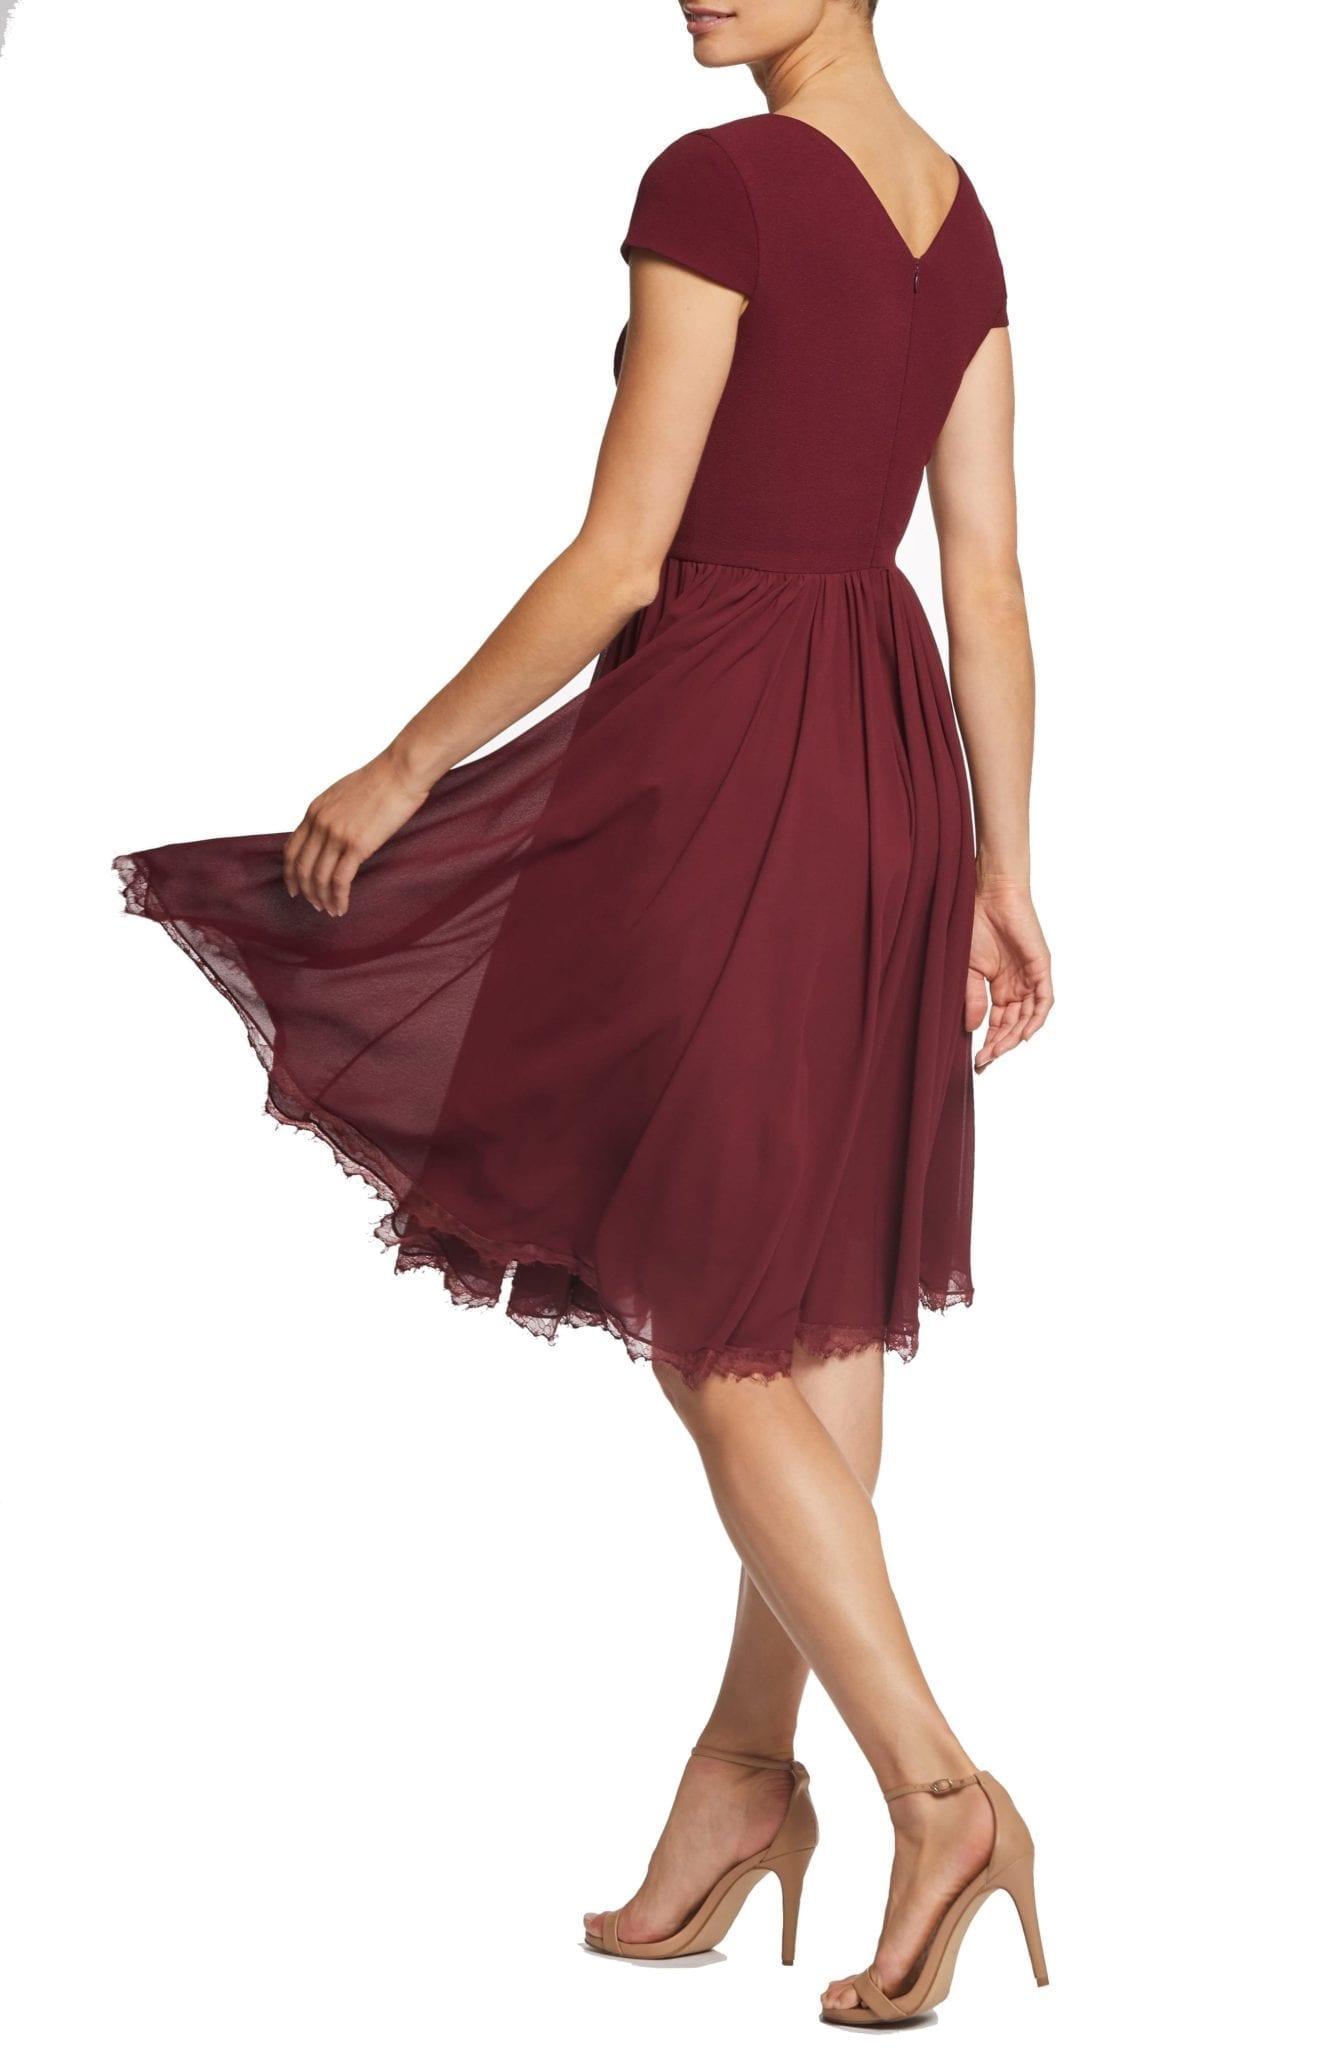 3090c80efe2a DRESS THE POPULATION Corey Chiffon Fit   Flare Burgundy Dress - We ...